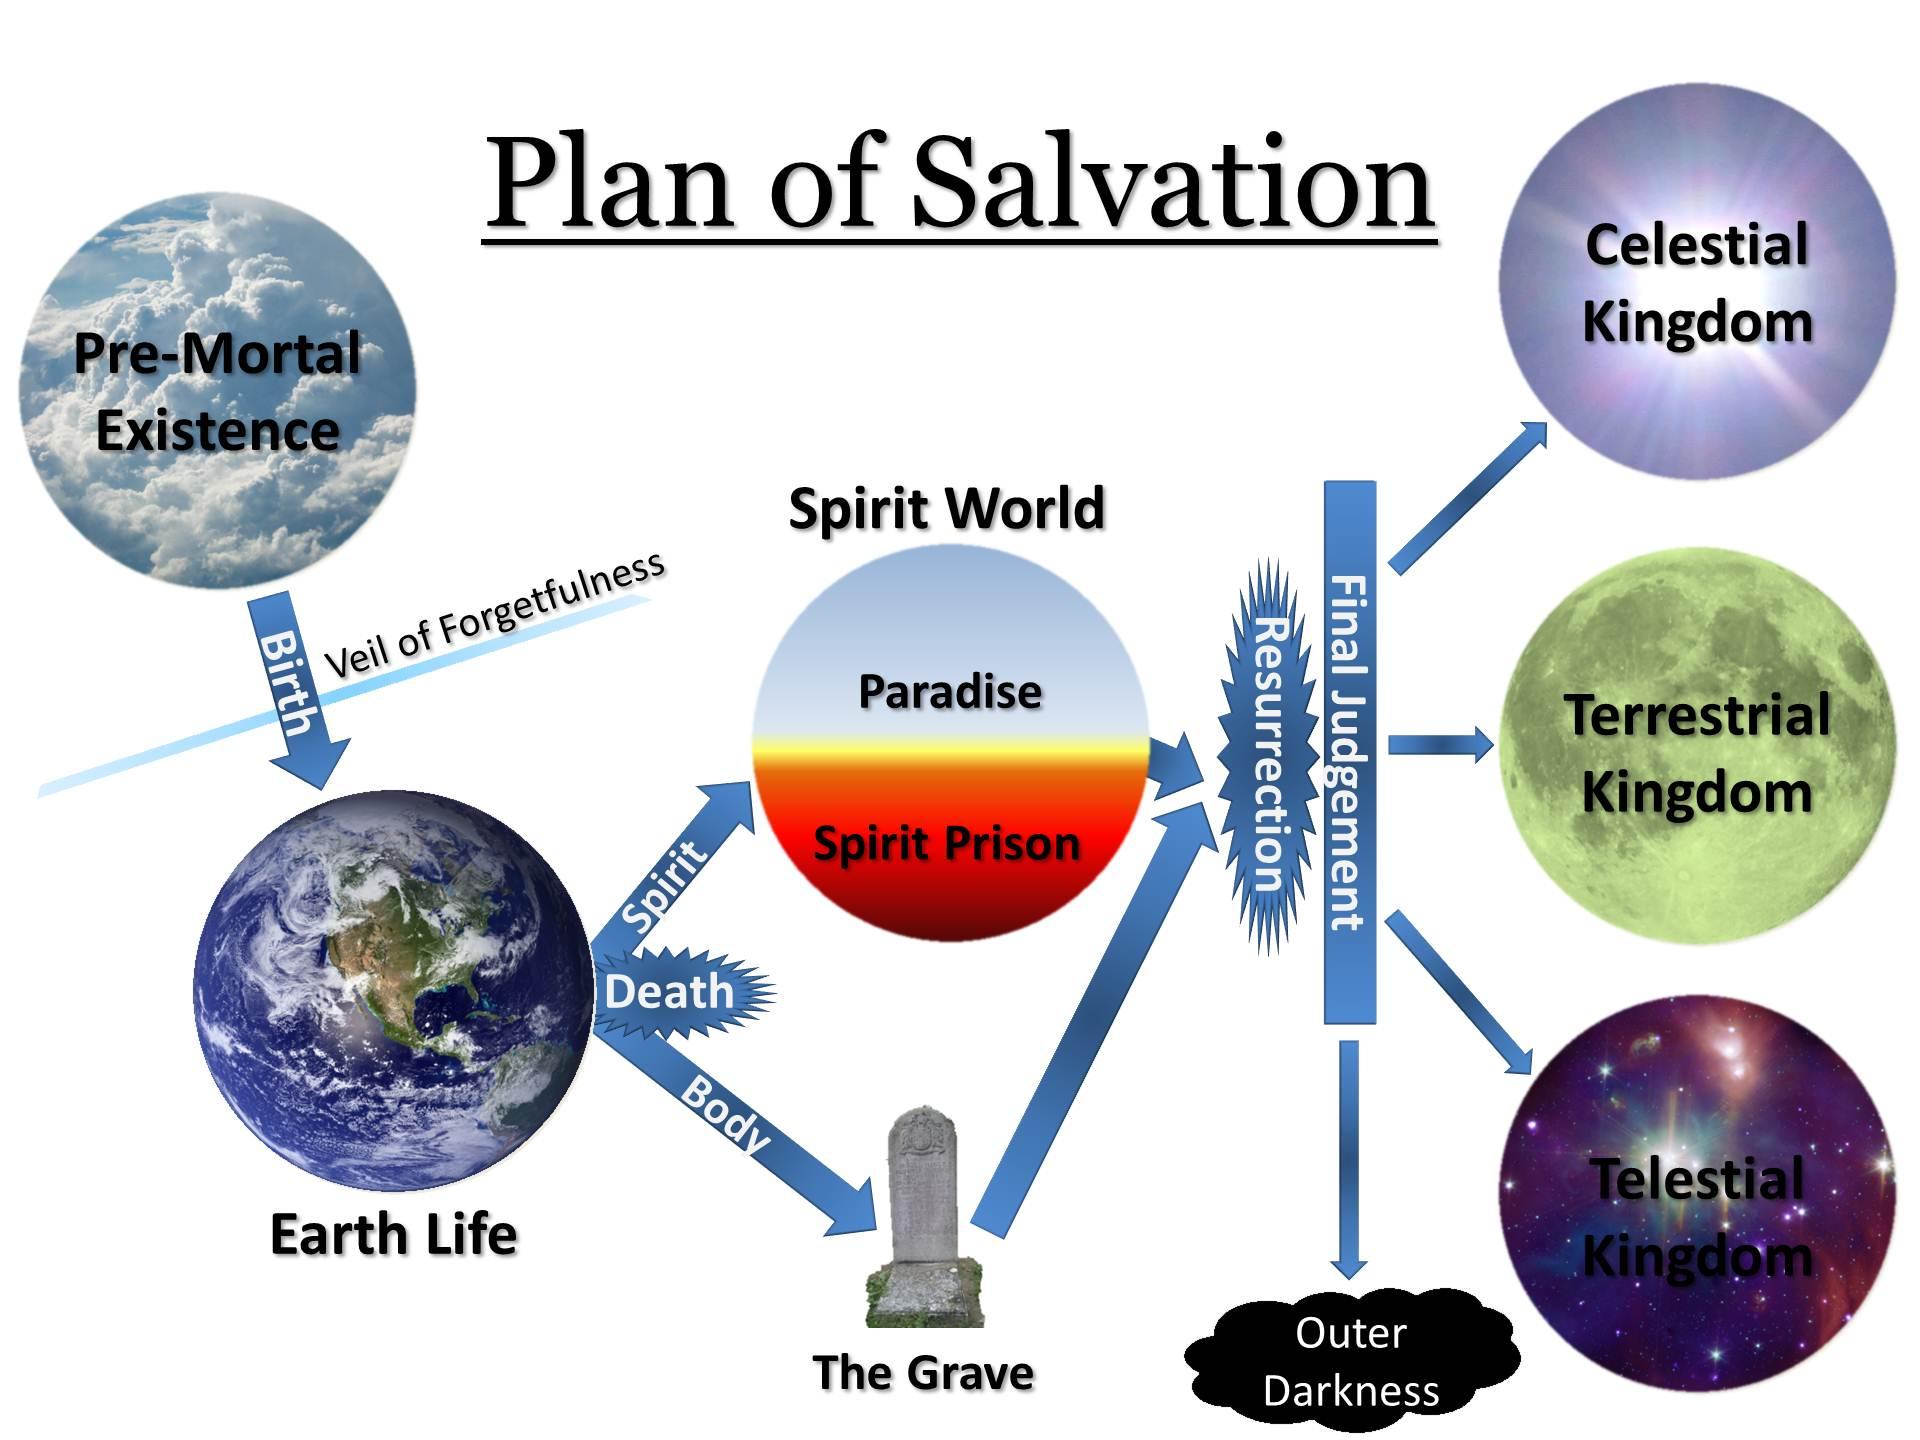 Mormon Plan_of_Salvation Illustration.jpg